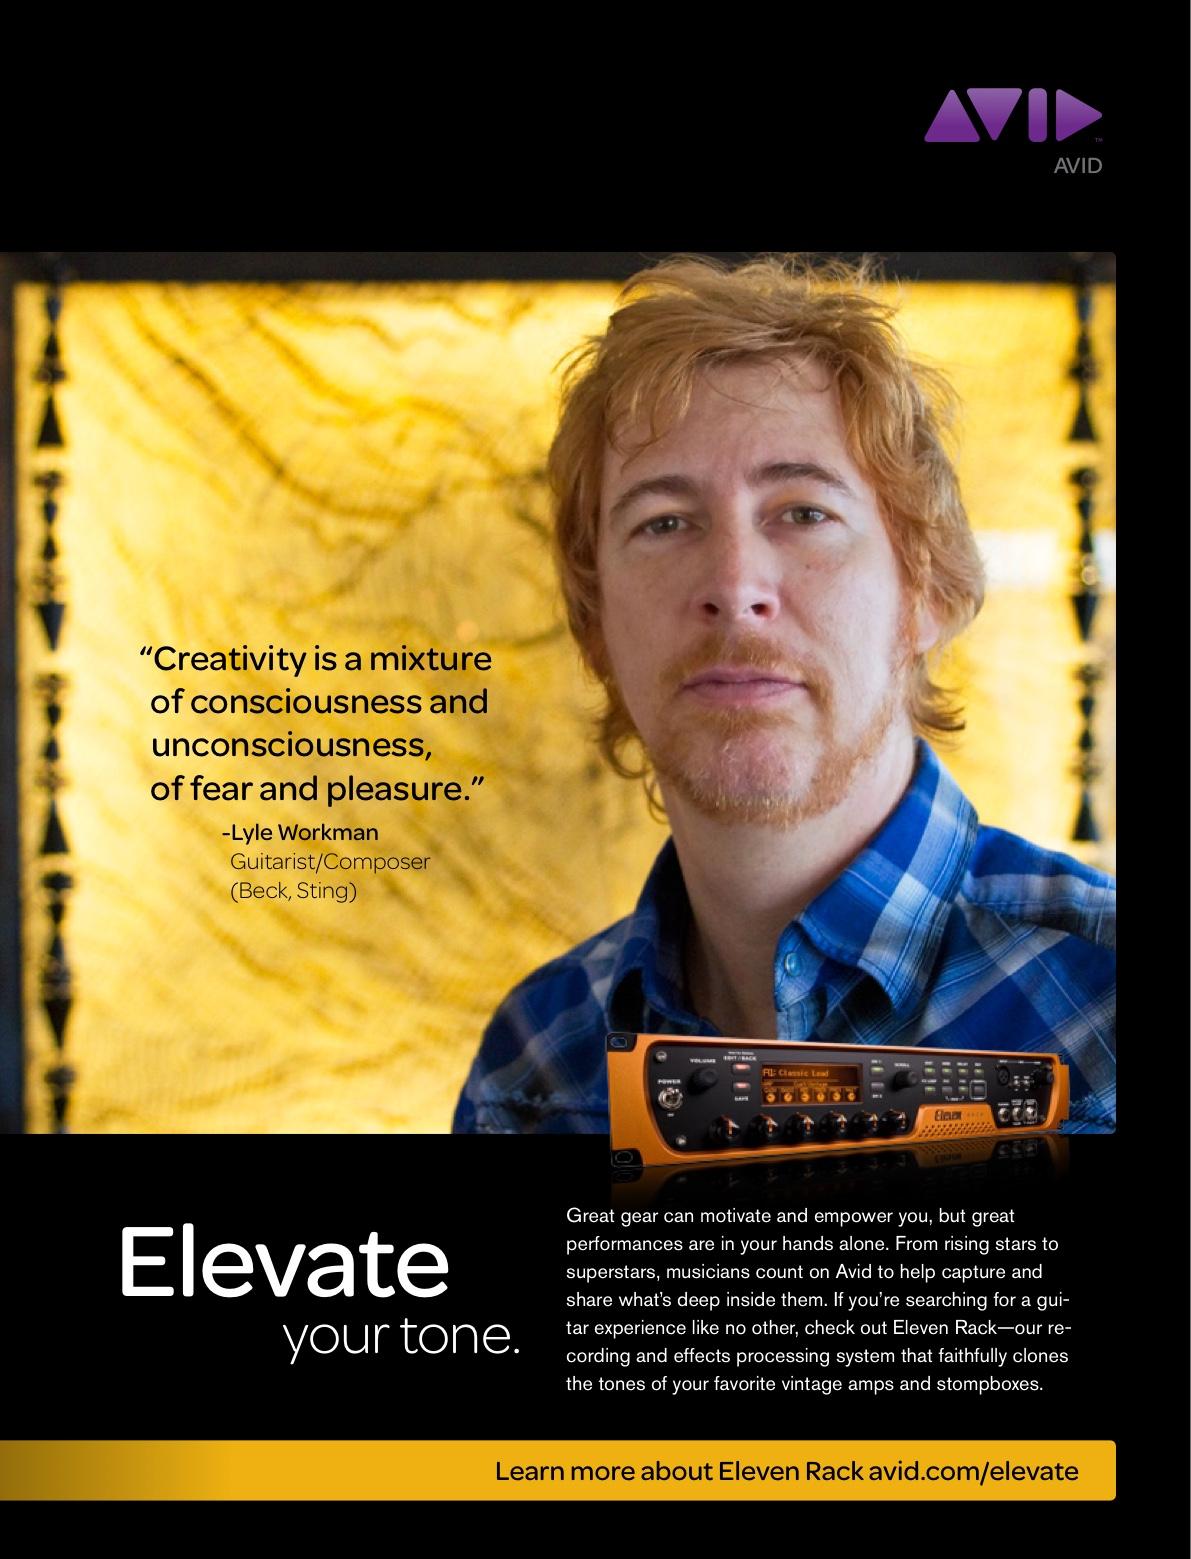 Avid_Elevate_Print_Campaign-3.jpg